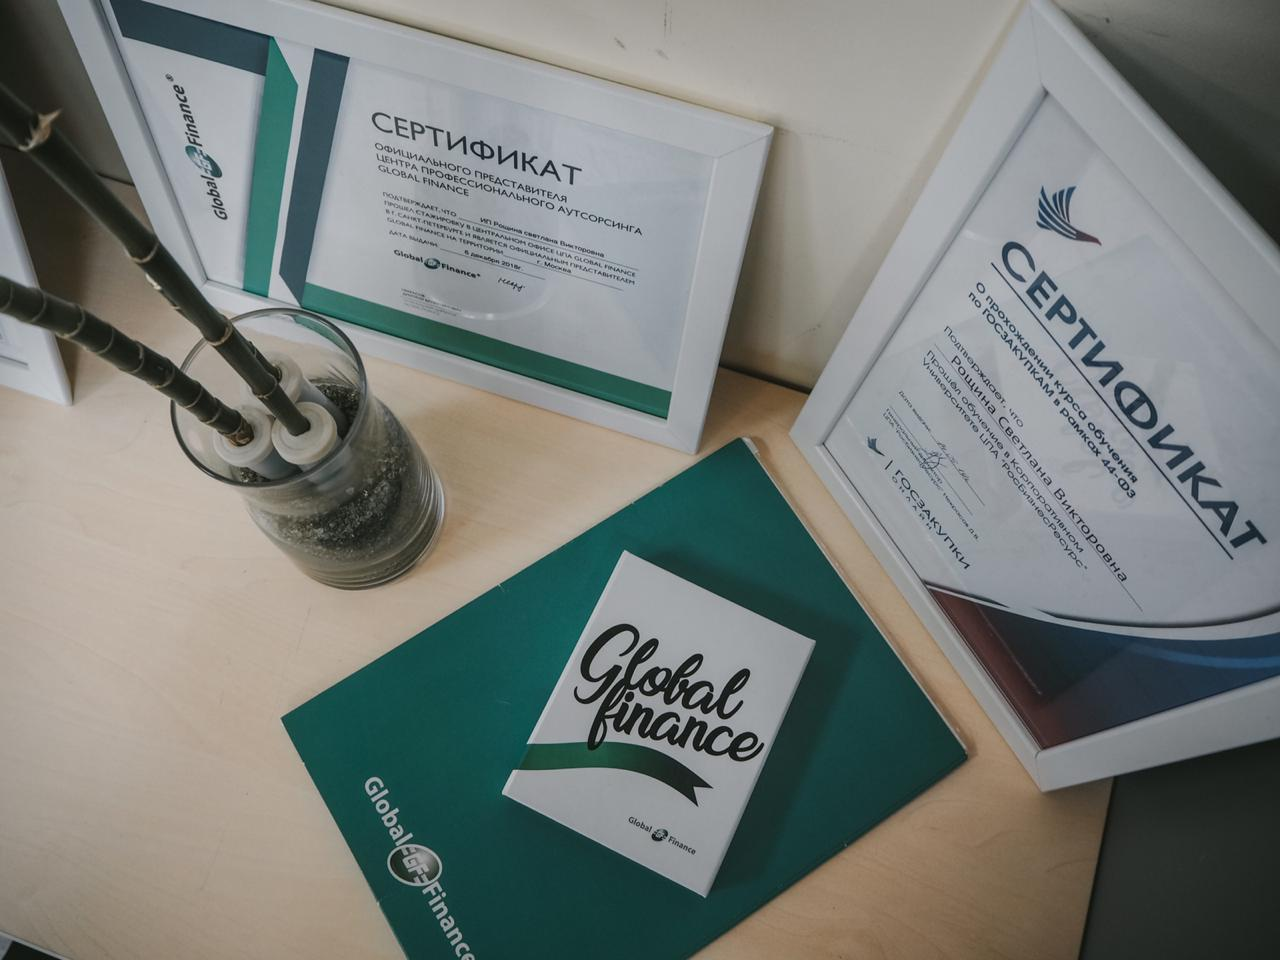 Аудиторские услуги Global Finance